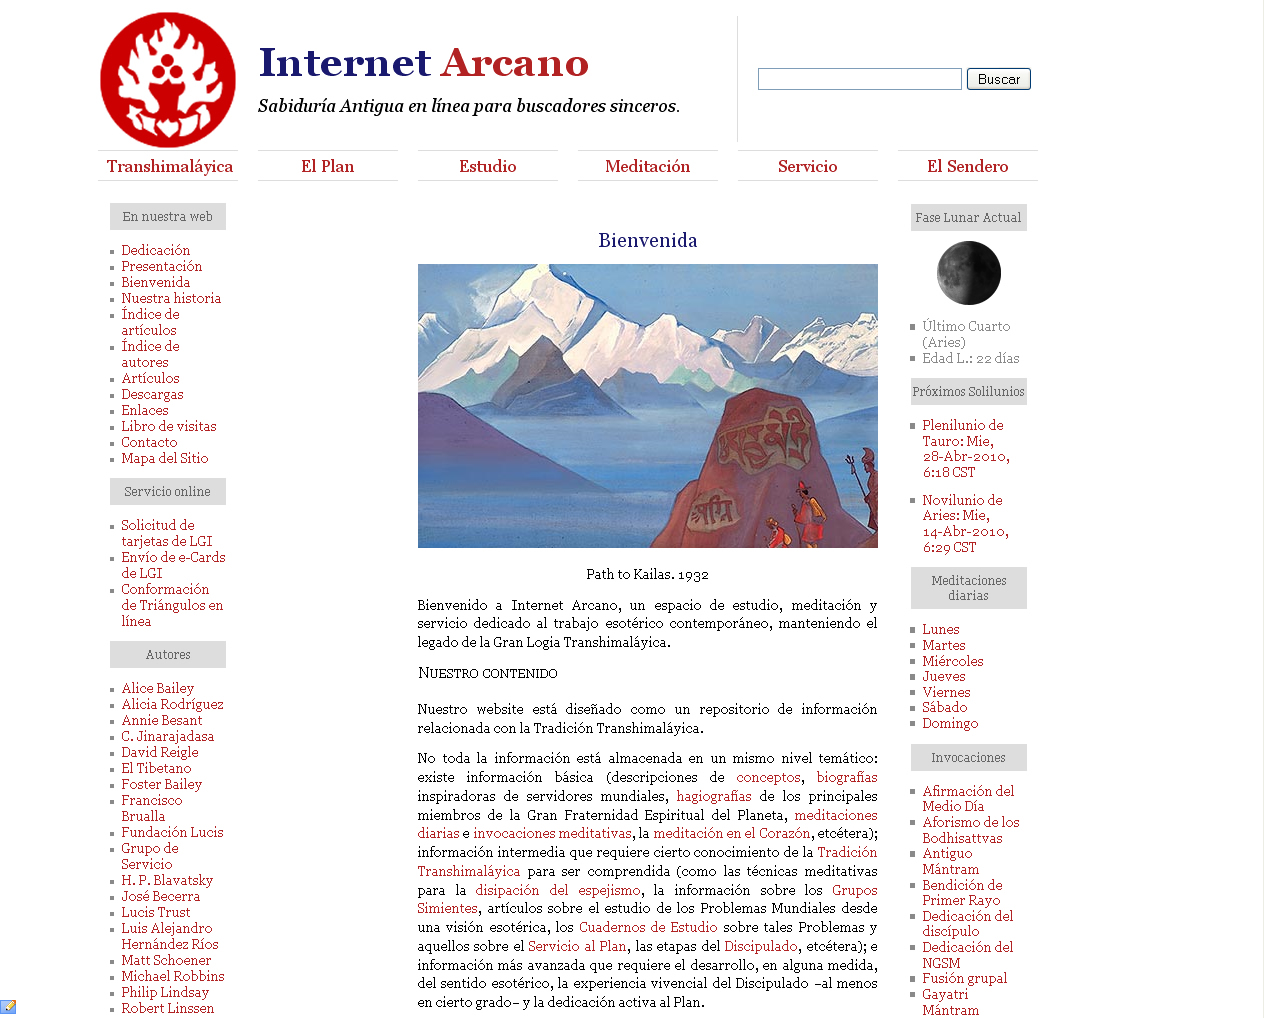 Internet Arcano 6.0